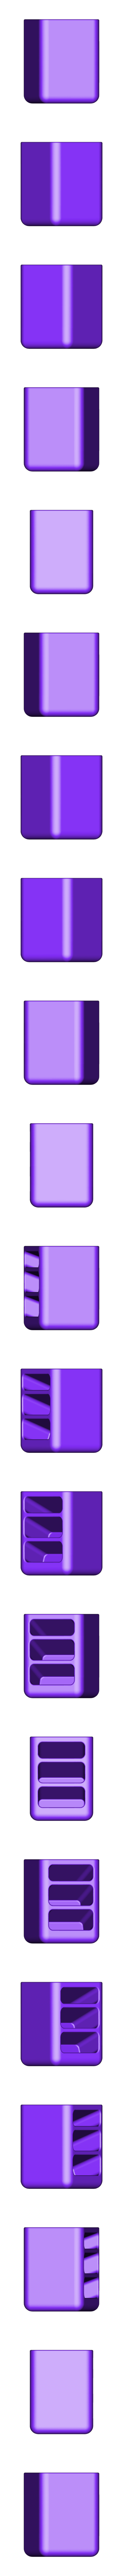 desk_organizer_v1.stl Download free STL file Desk Organizer • 3D printable design, PJ_